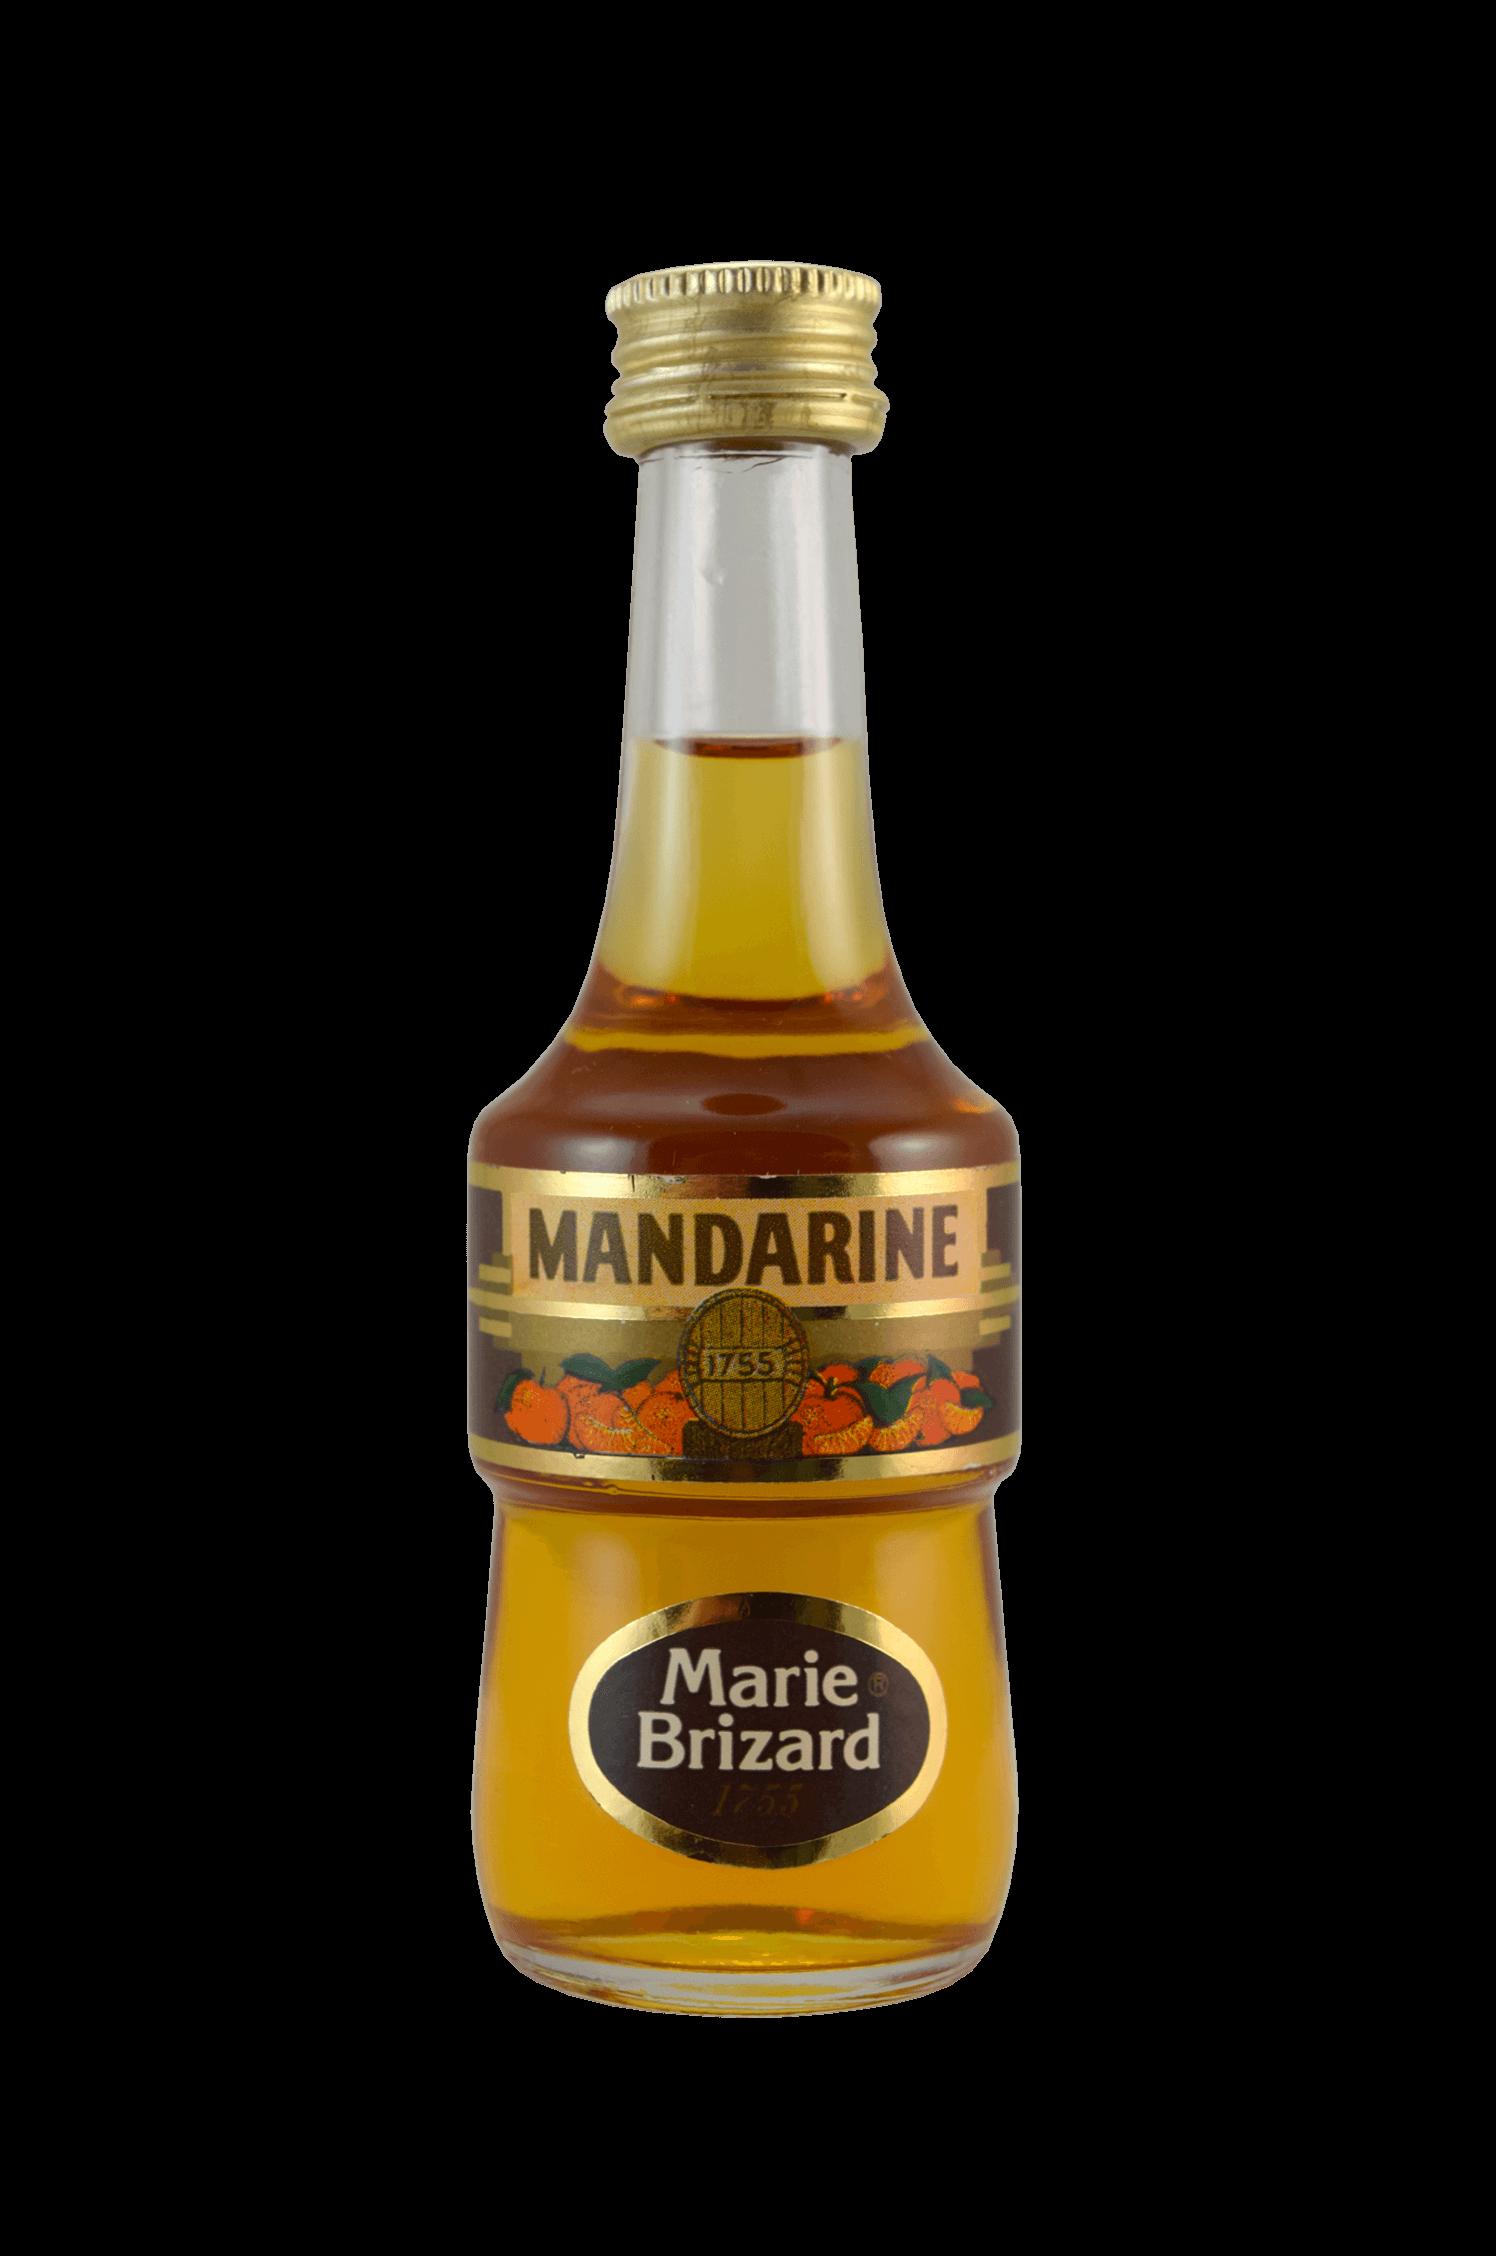 Marie Brizard Mandarine